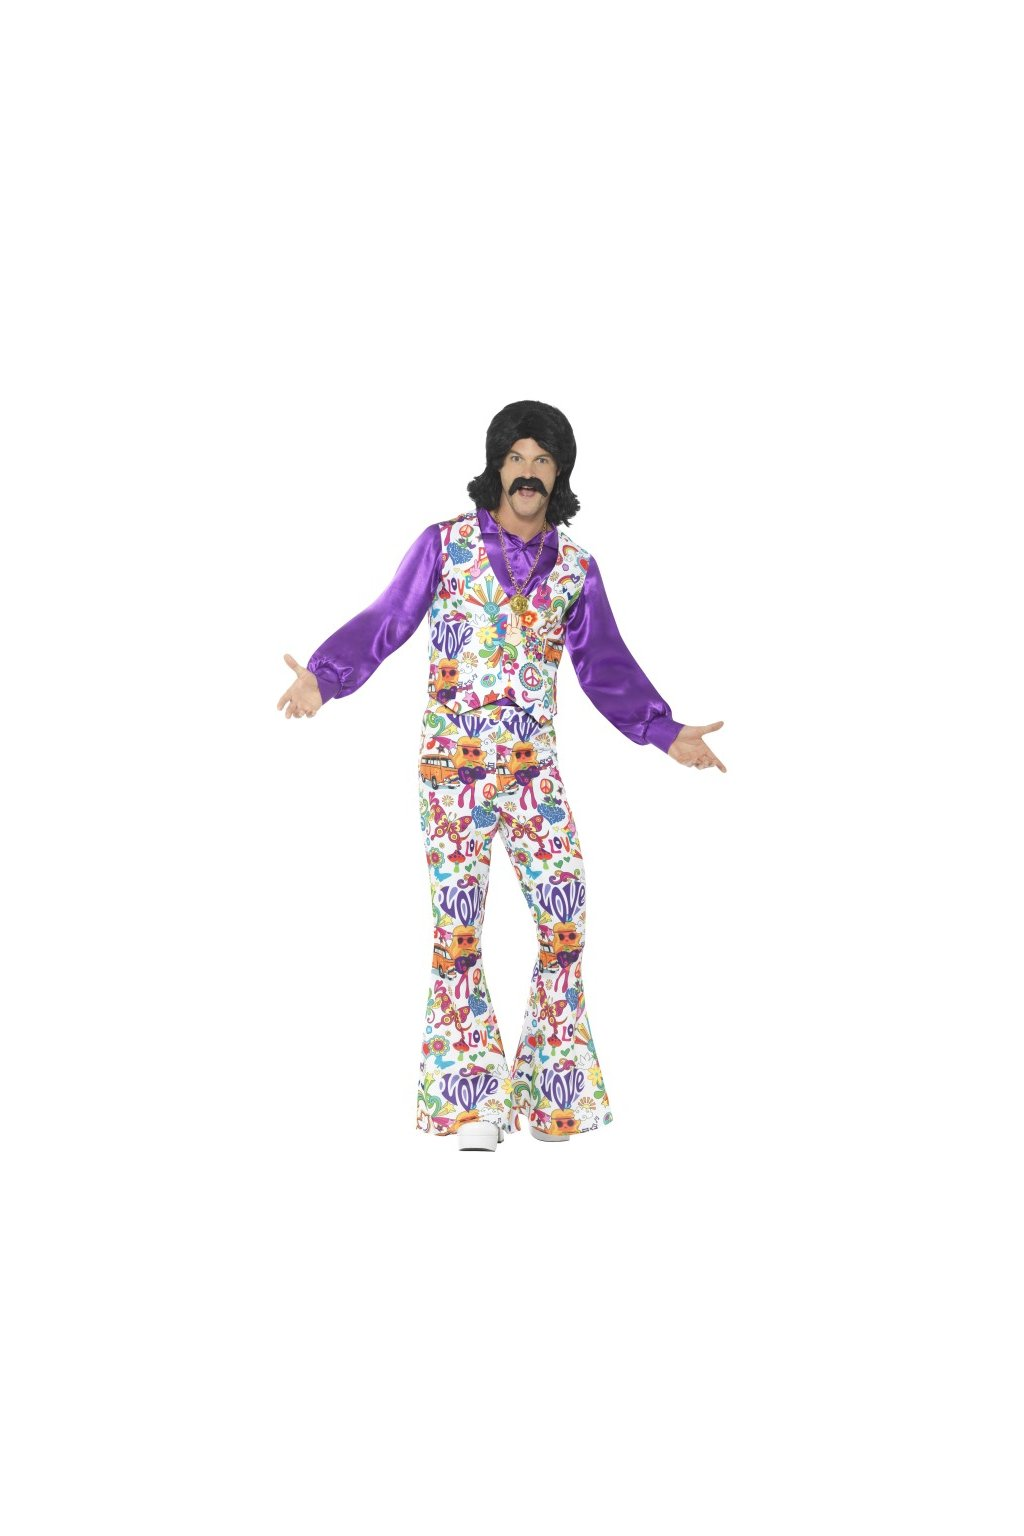 Hippie kostým - groovy 60´s